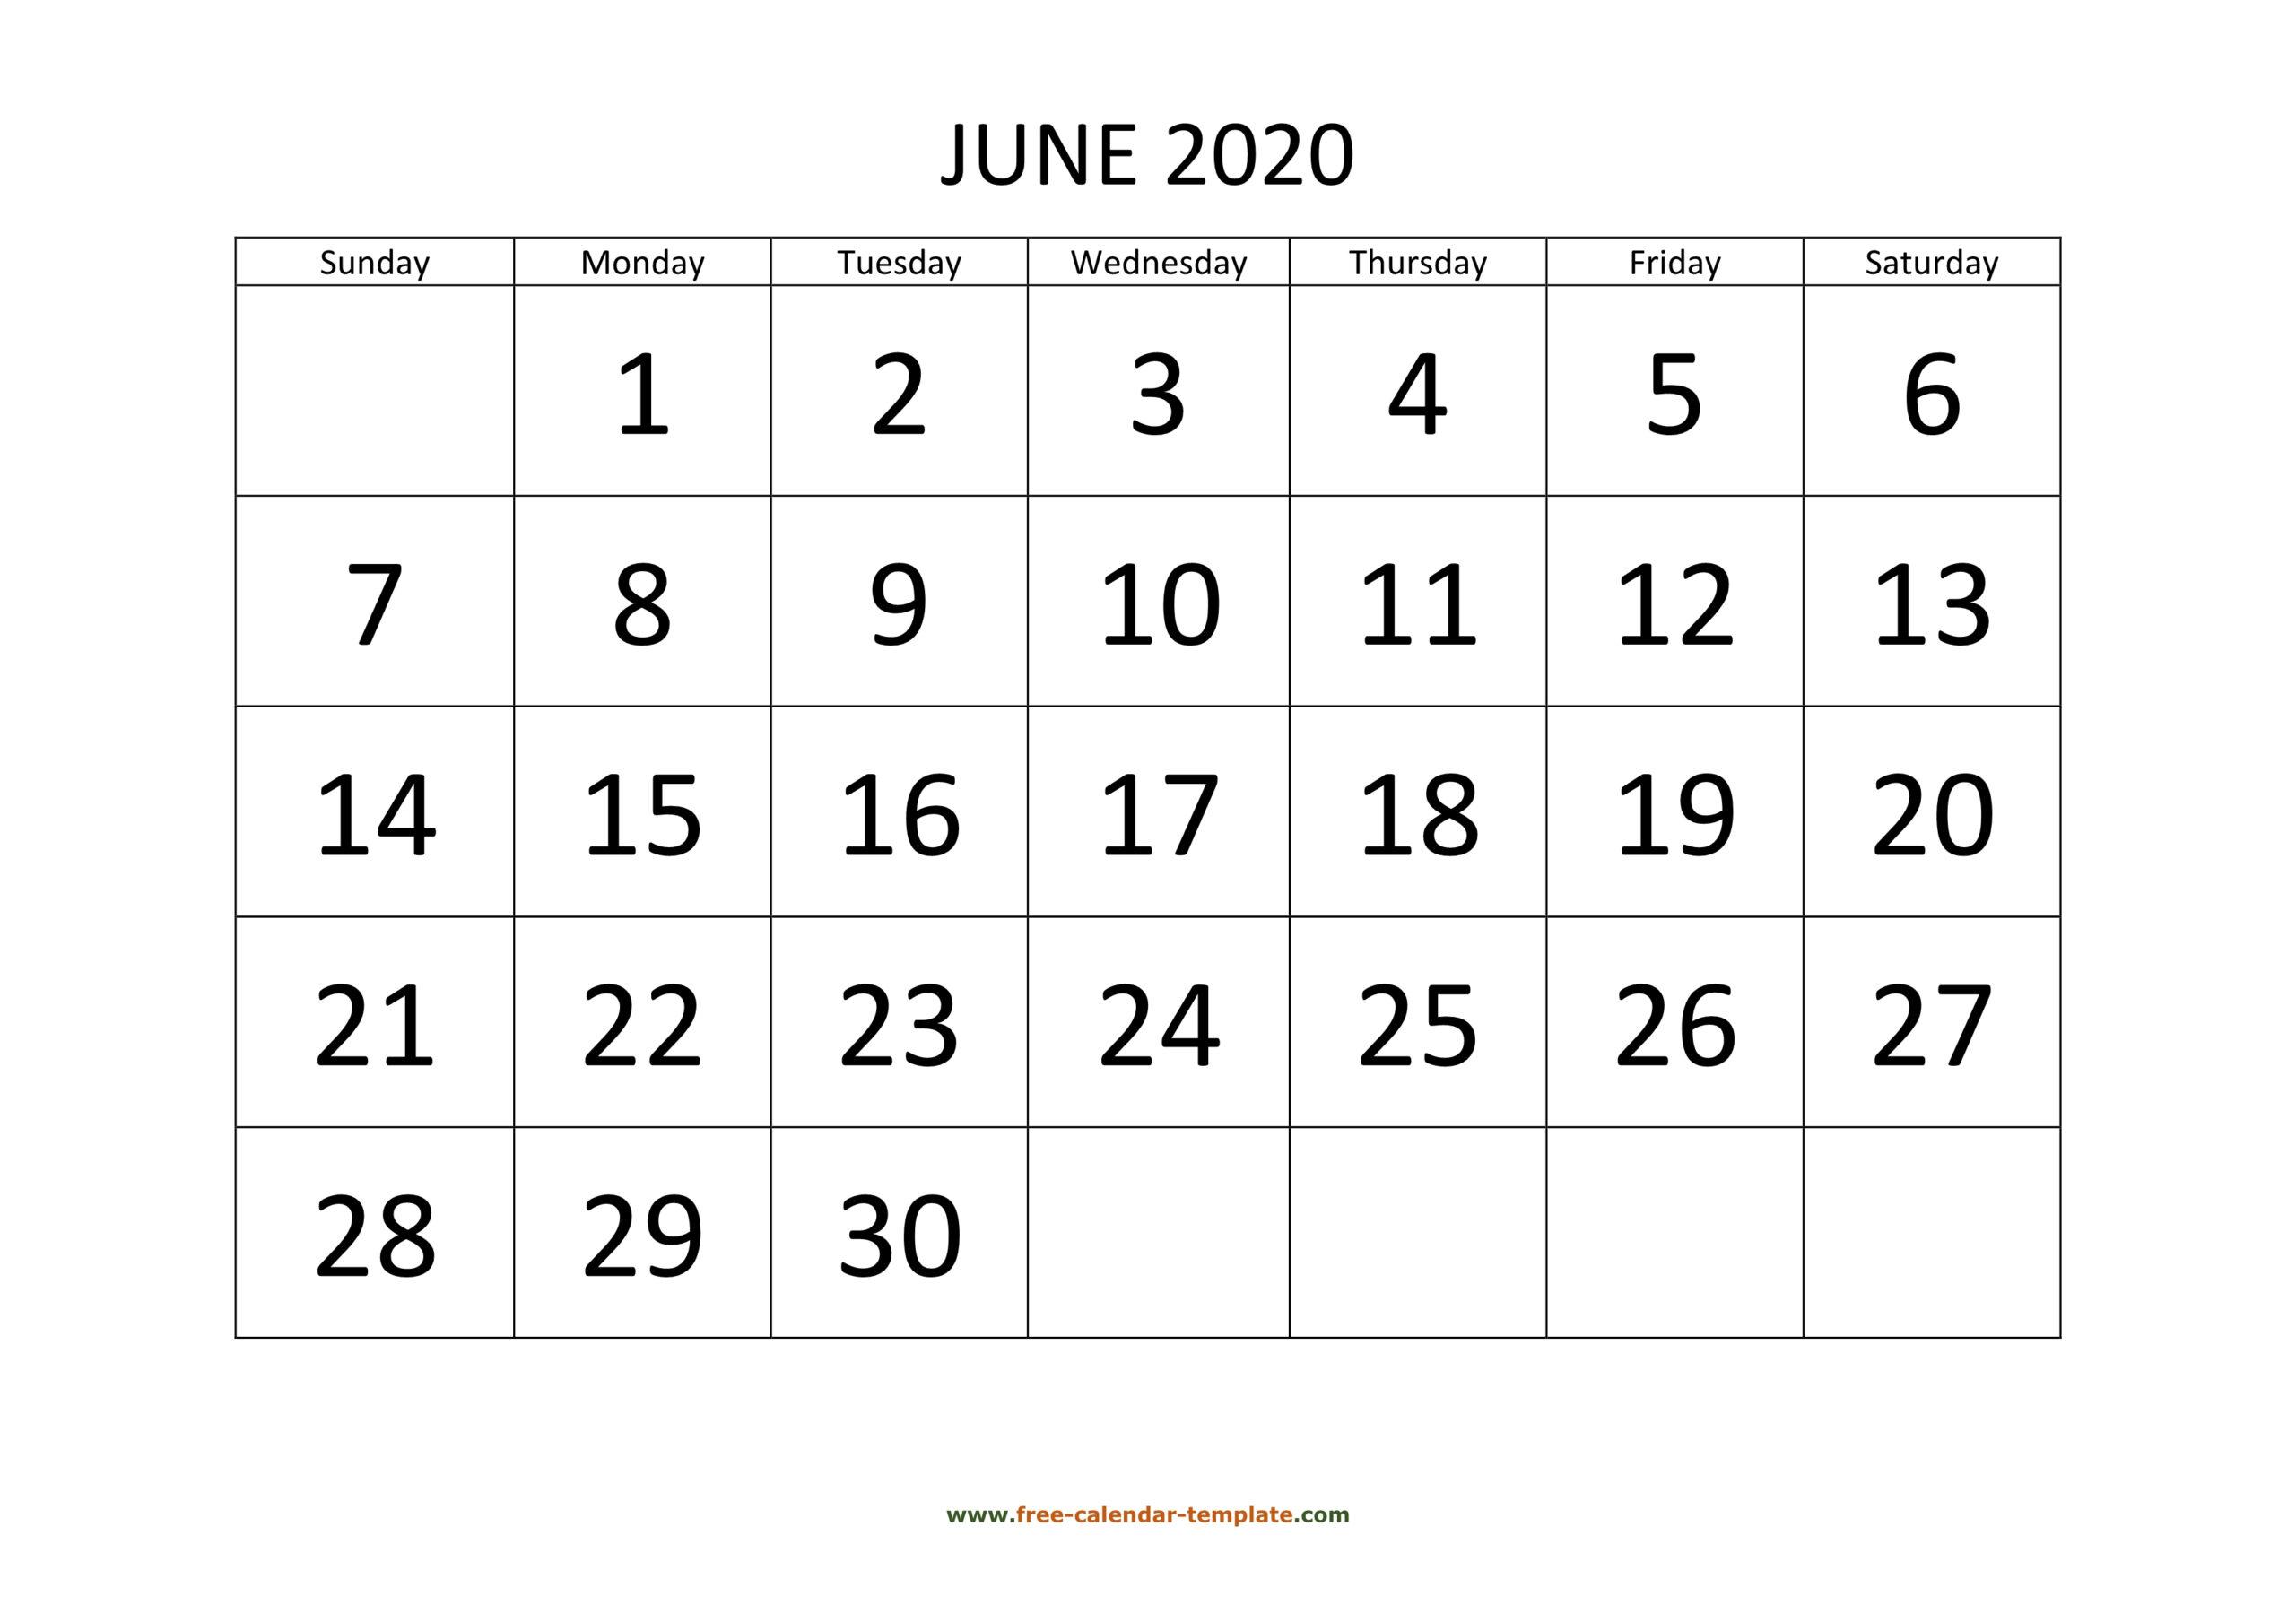 June 2020 Calendar Designed With Large Font (Horizontal pertaining to Large Number Calendar